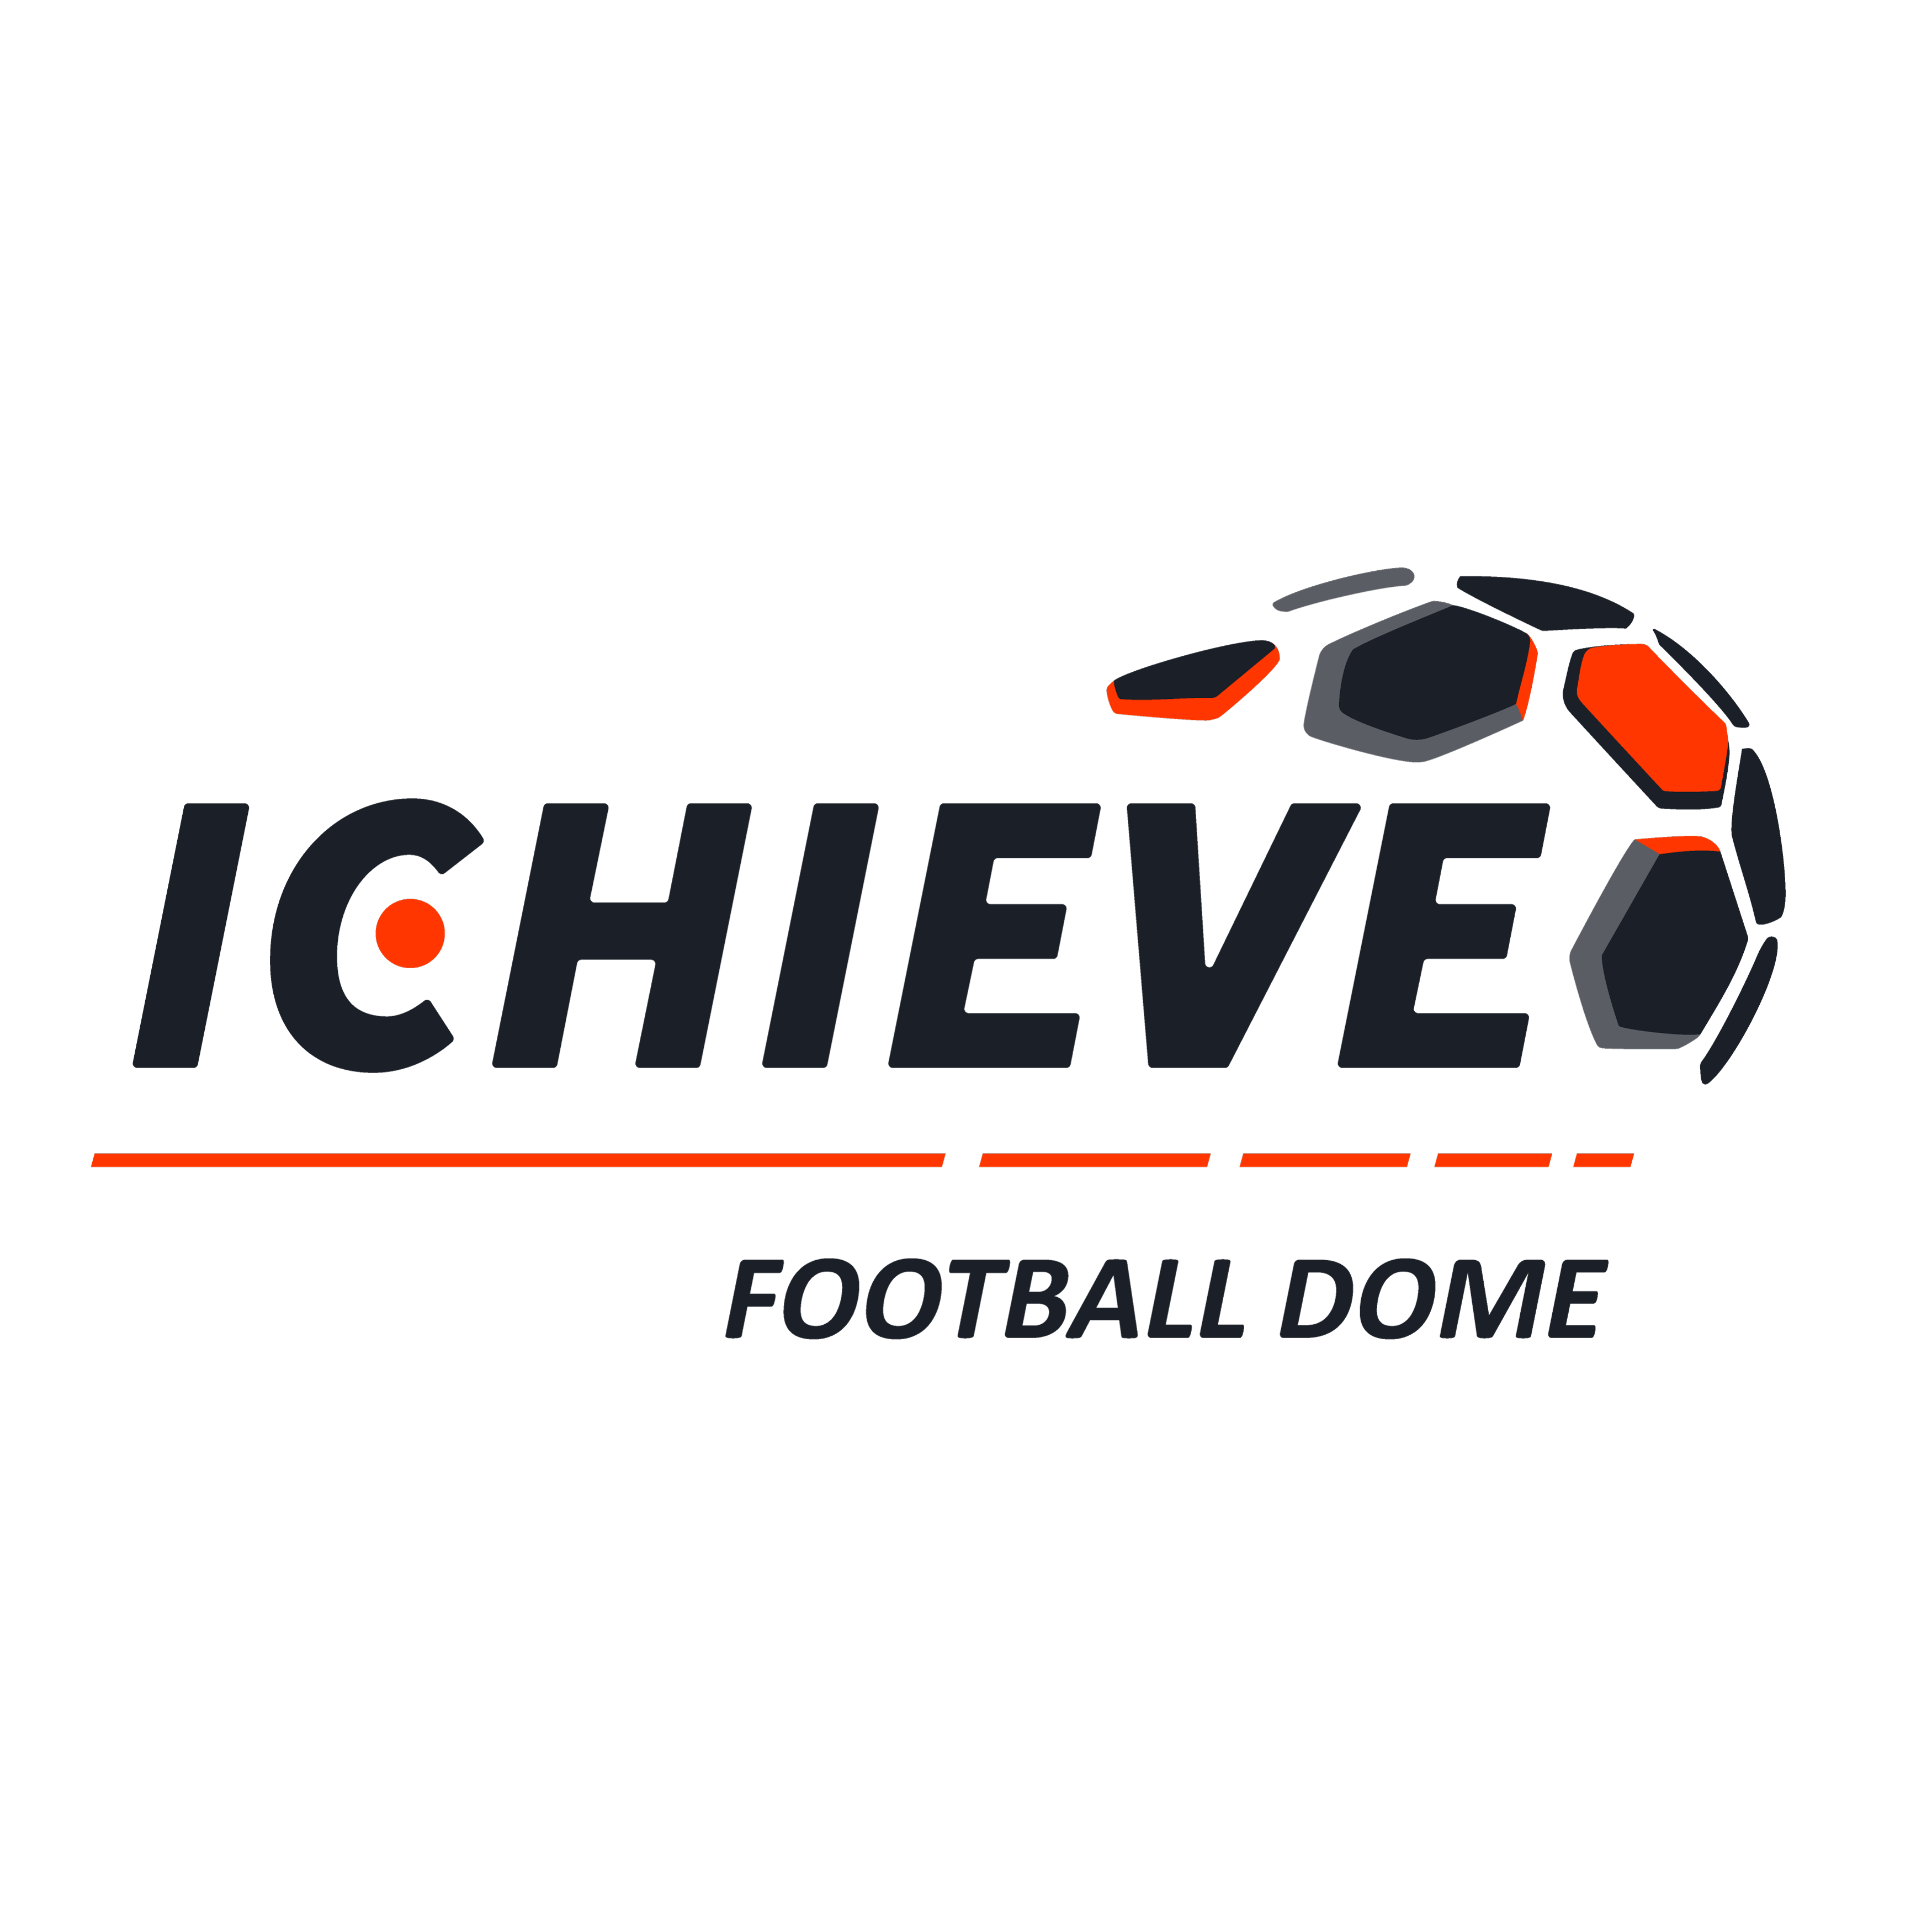 ICHIEVE-Logo-Main-DEF